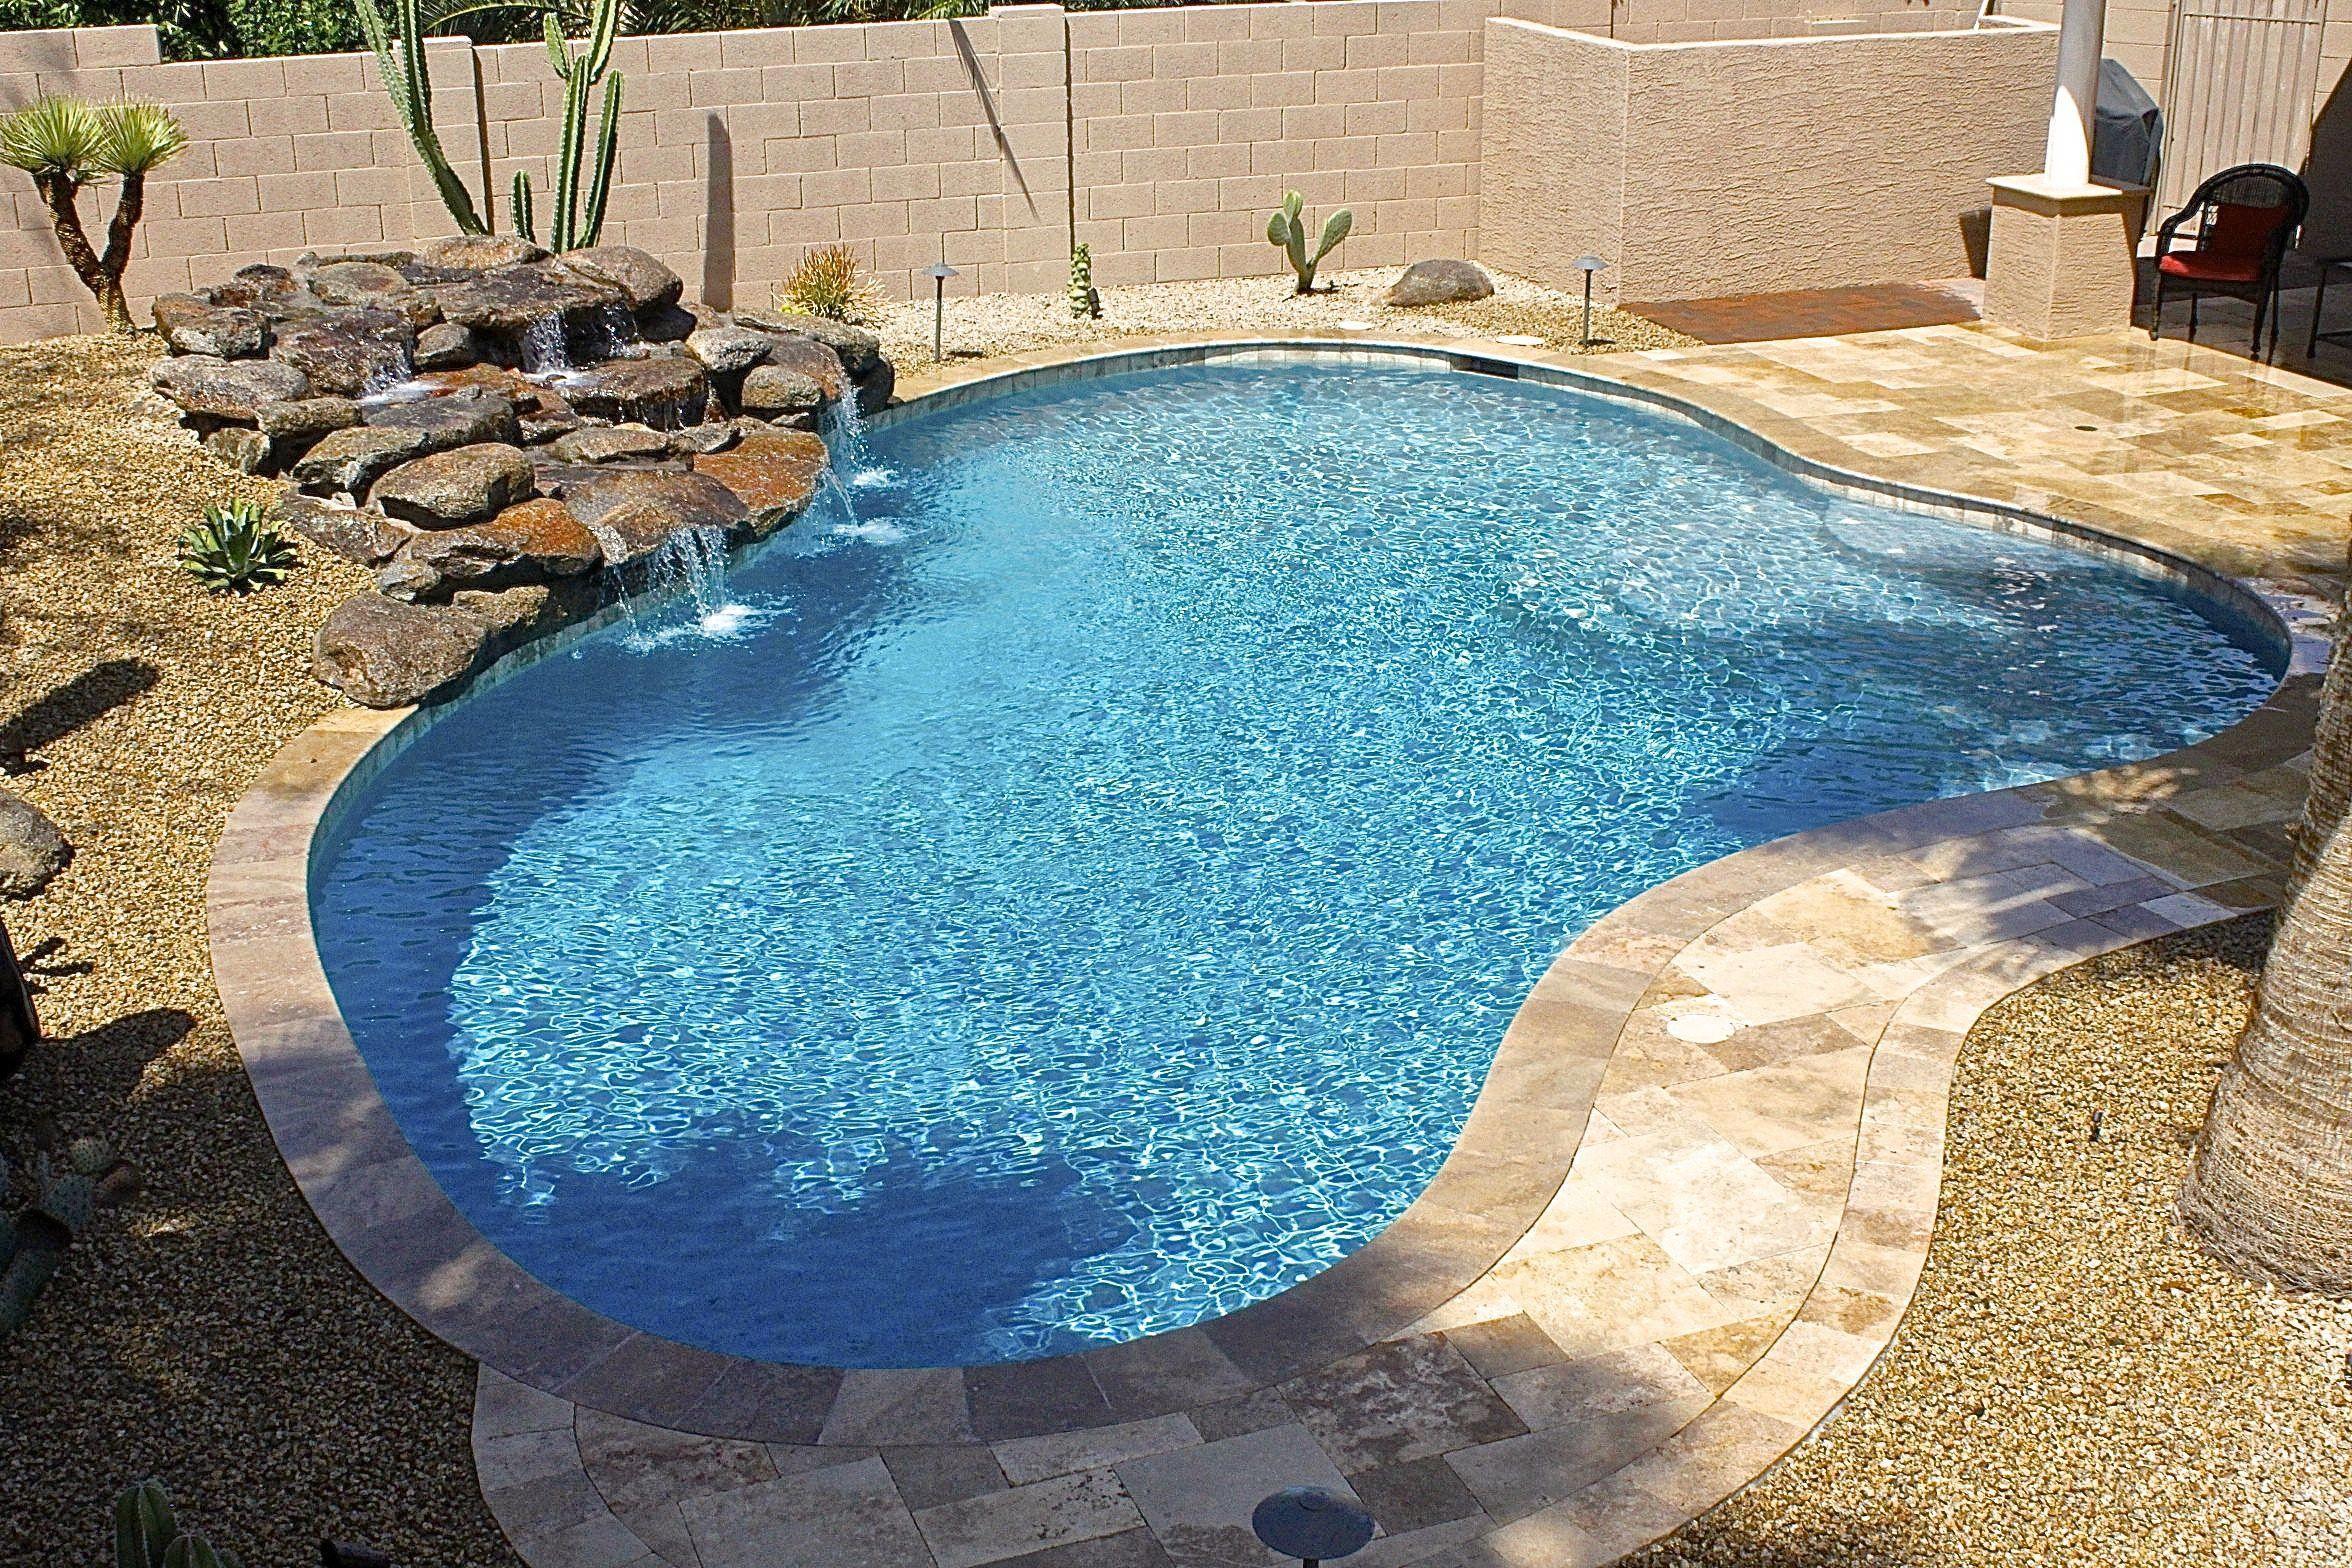 6 Small Backyard Ideas with a Pool | Freeform pools, Pools ... |Small Freeform Pools With Waterfalls